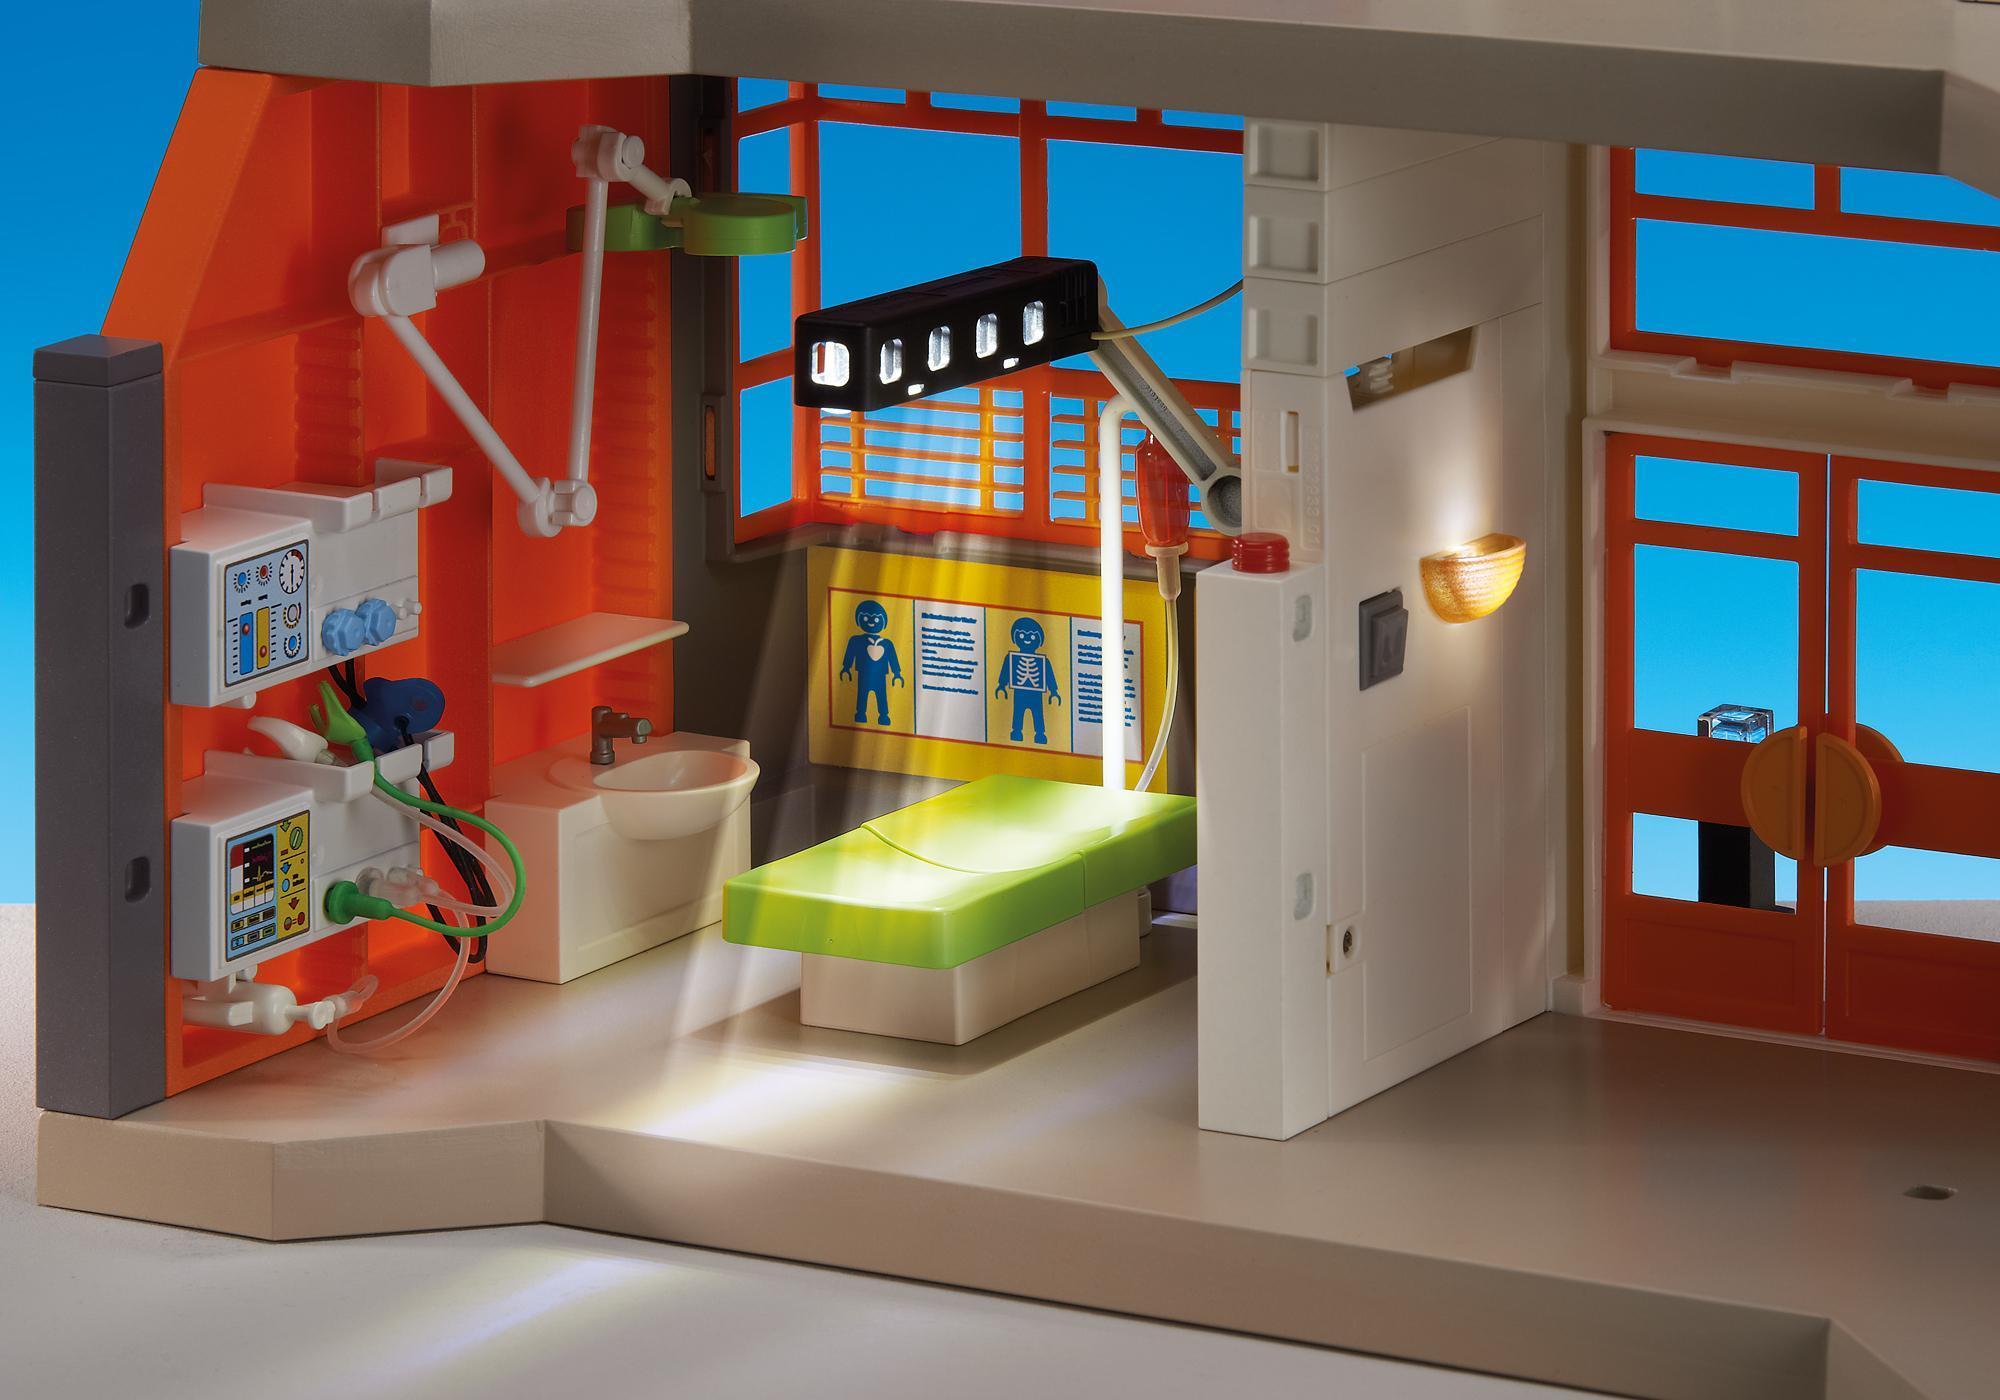 http://media.playmobil.com/i/playmobil/6446_product_extra1/Kit d'éclairage pour hôpital pédiatrique